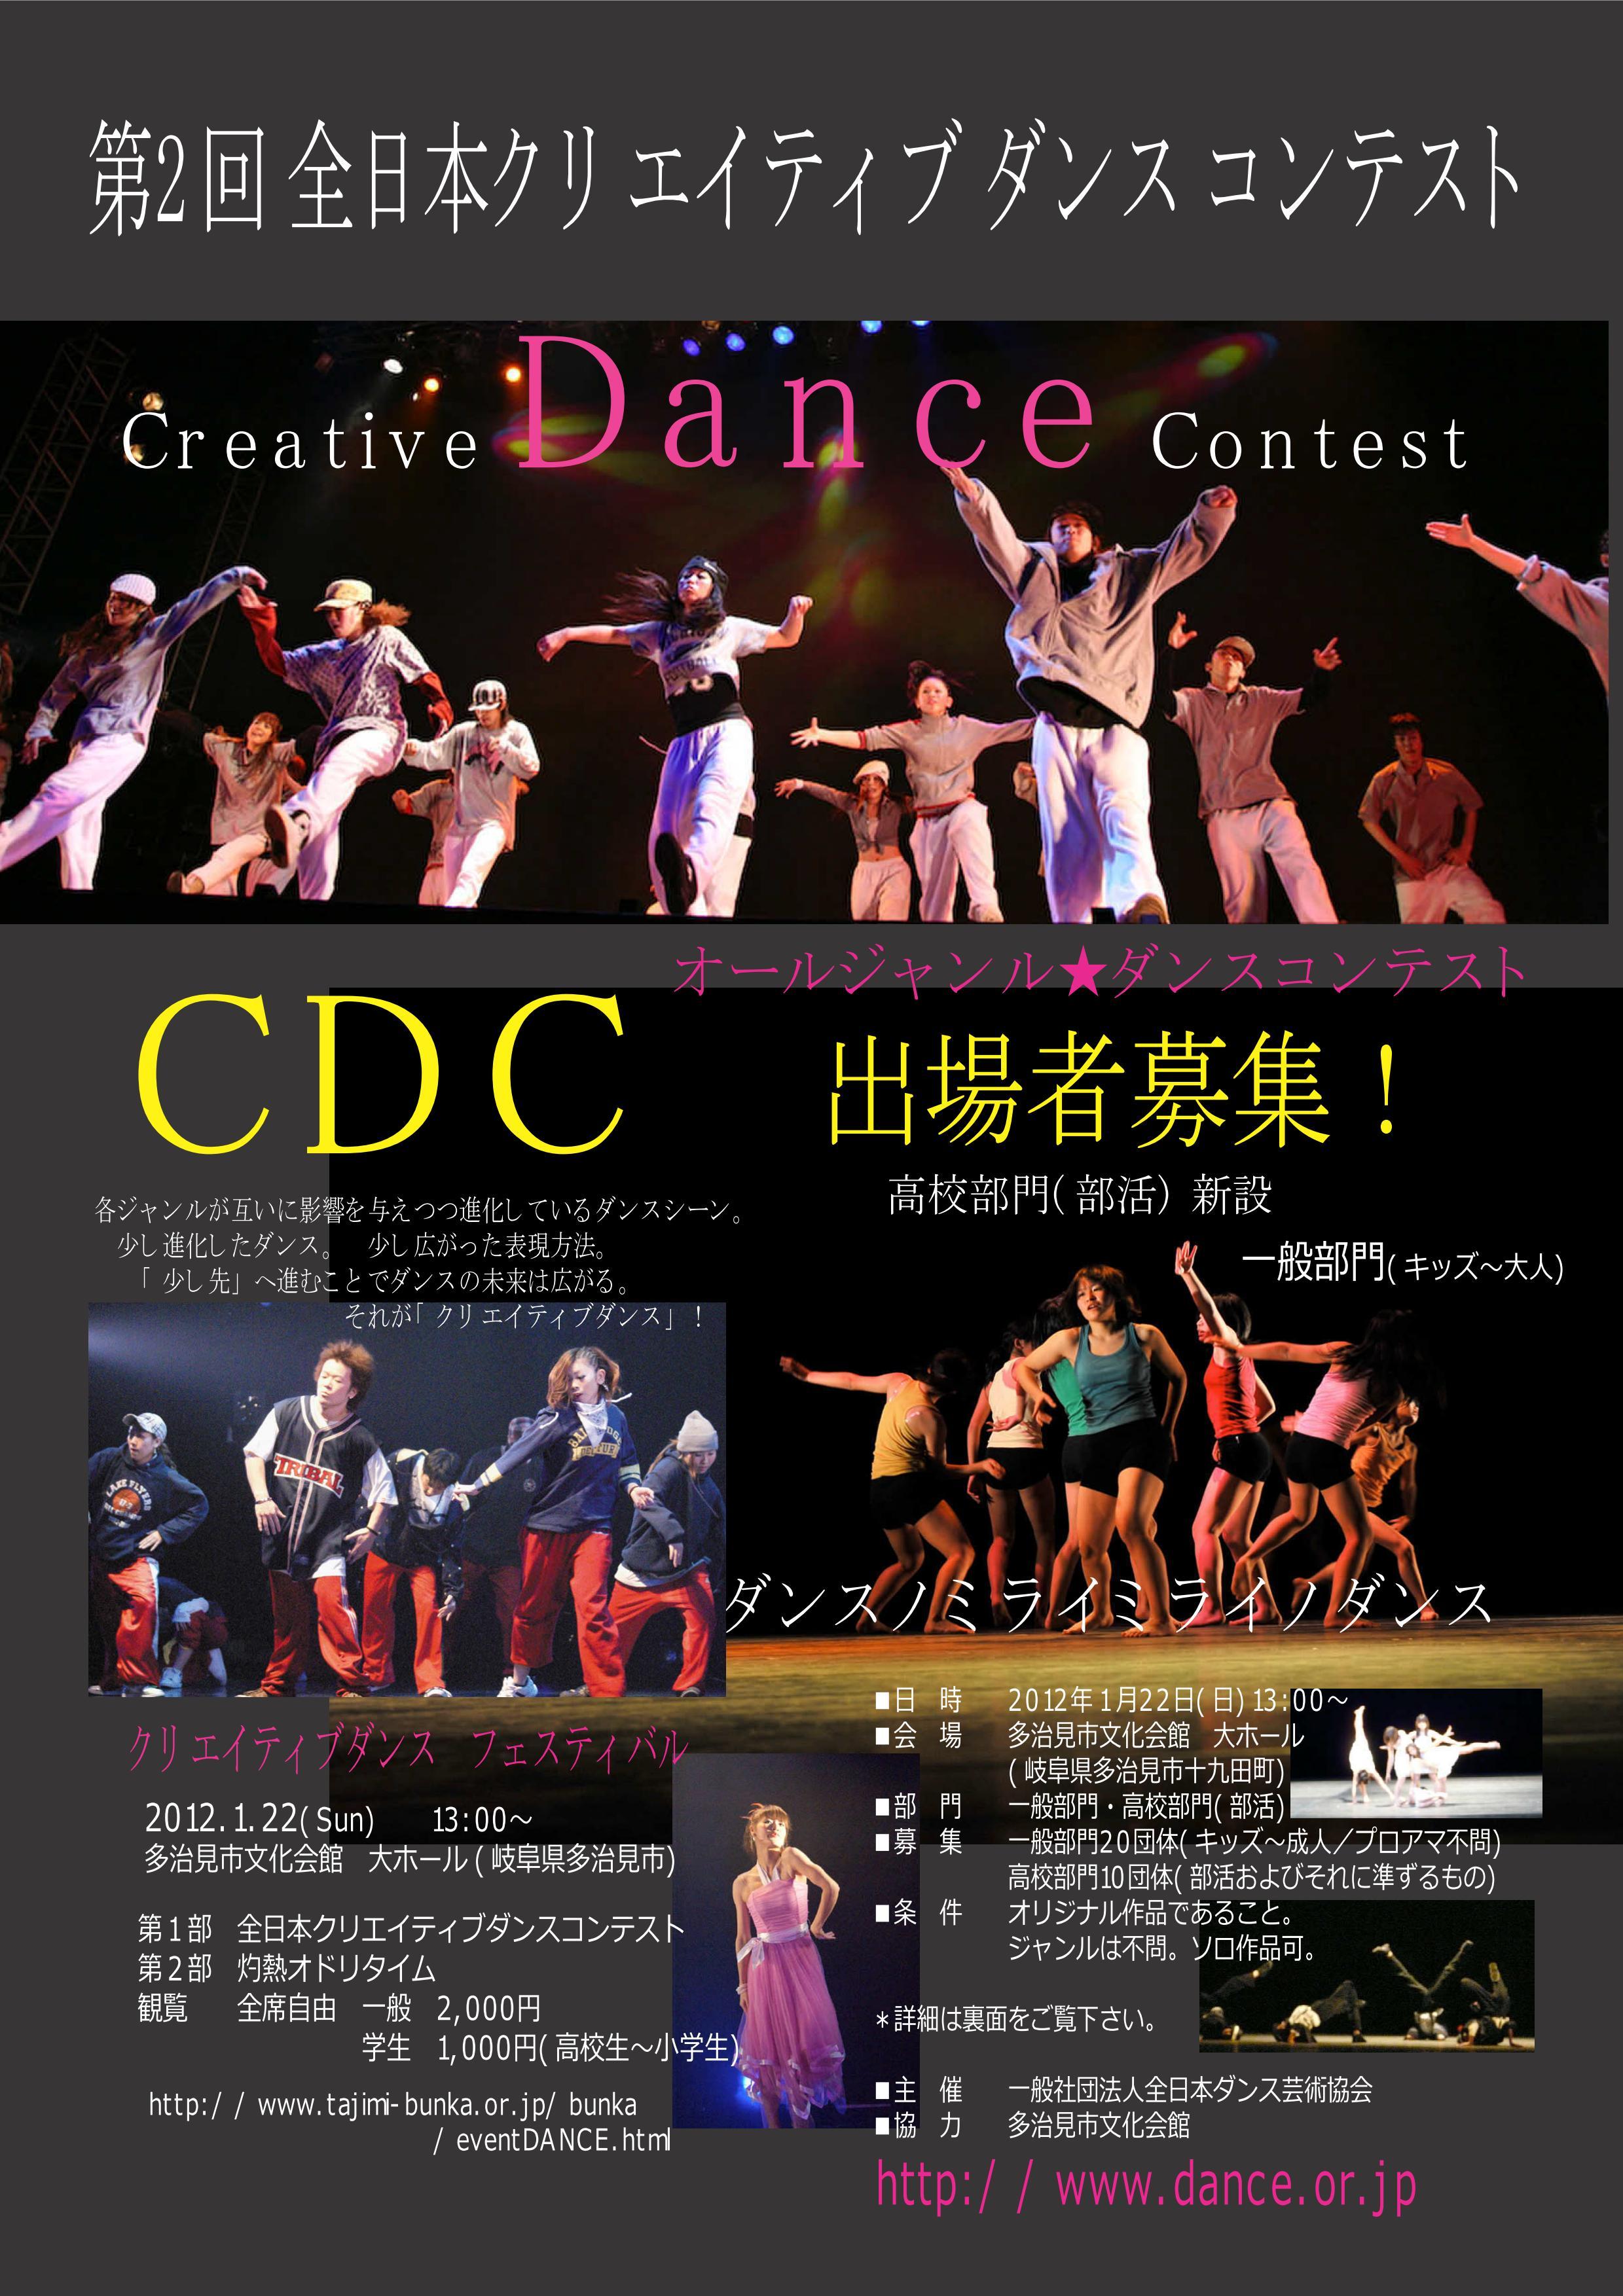 http://www.aasd.jp/wp-content/uploads/cdc-2012.jpg